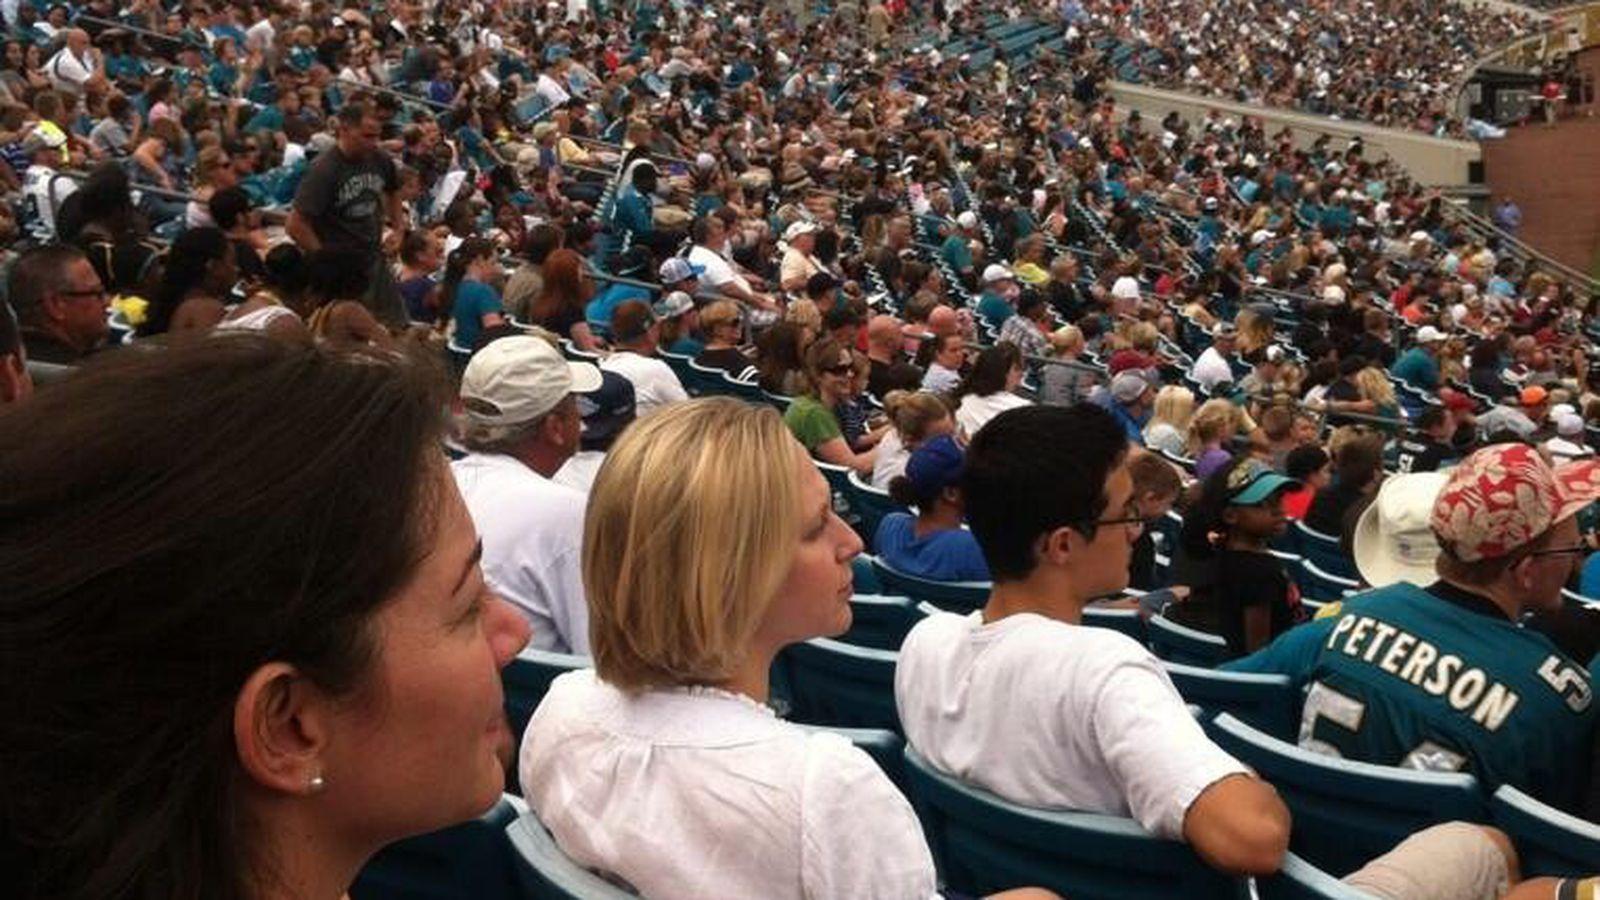 19,000 show up for Jaguars scrimmage